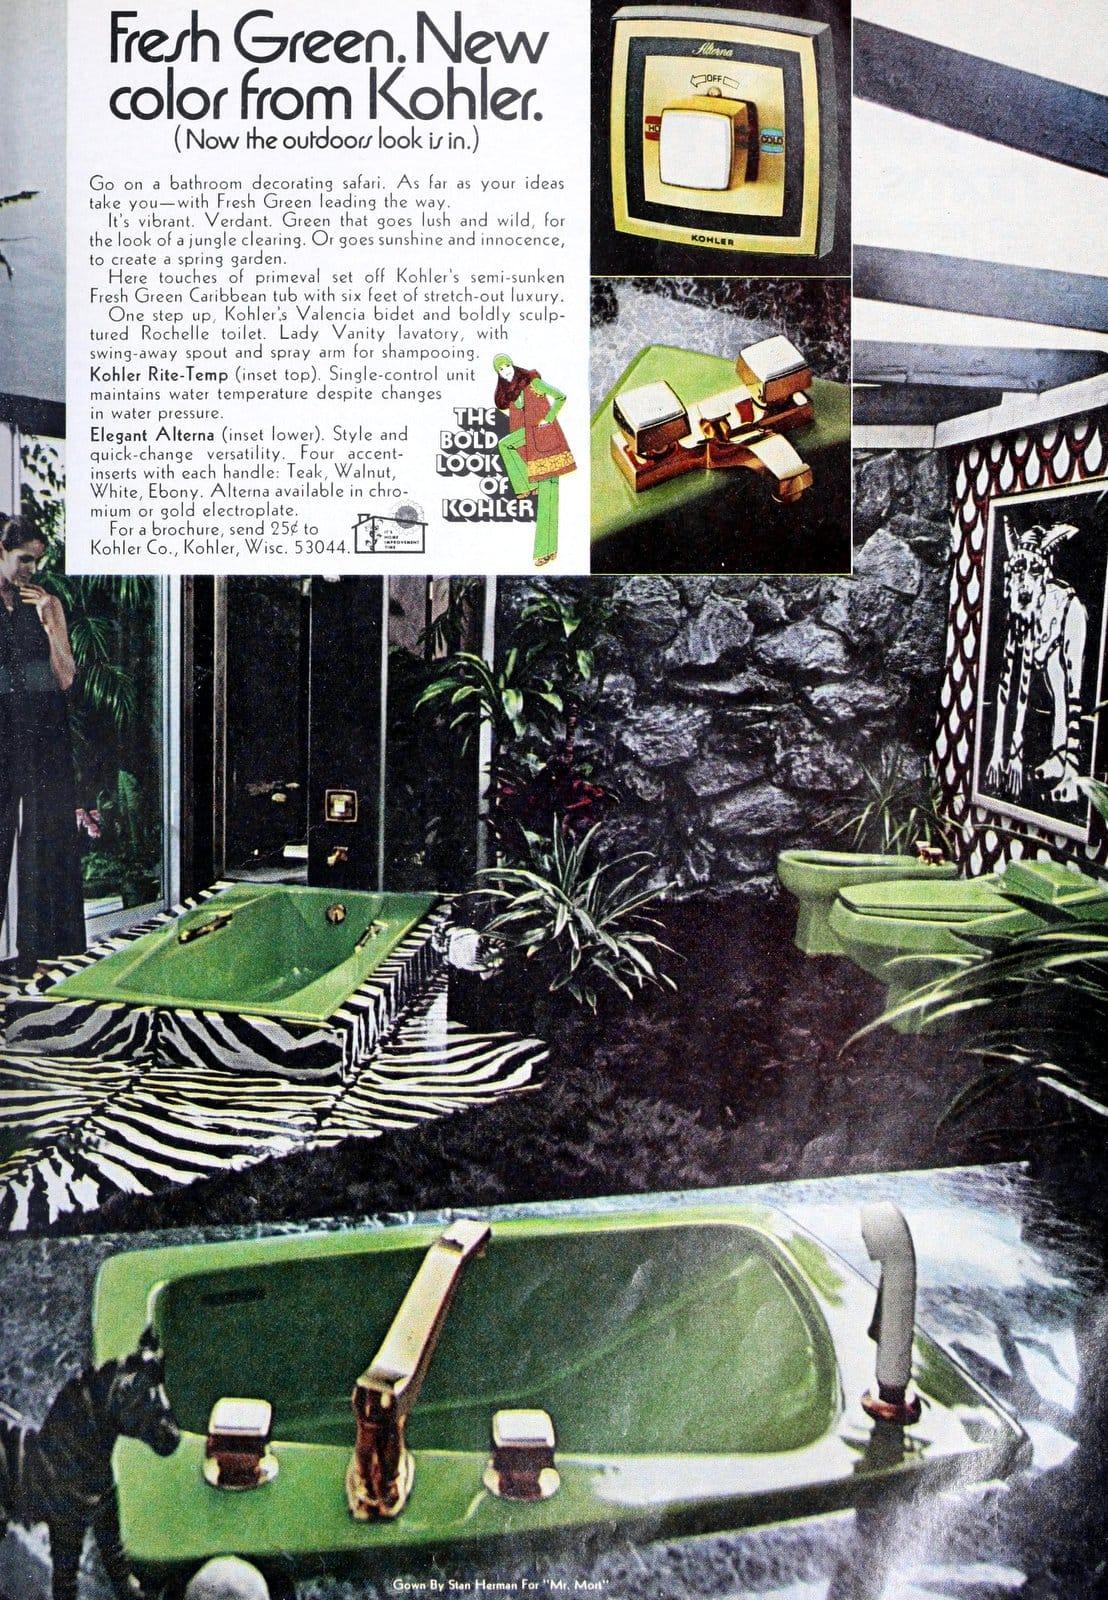 Green bathroom tub sink toilet and bidet (1971)